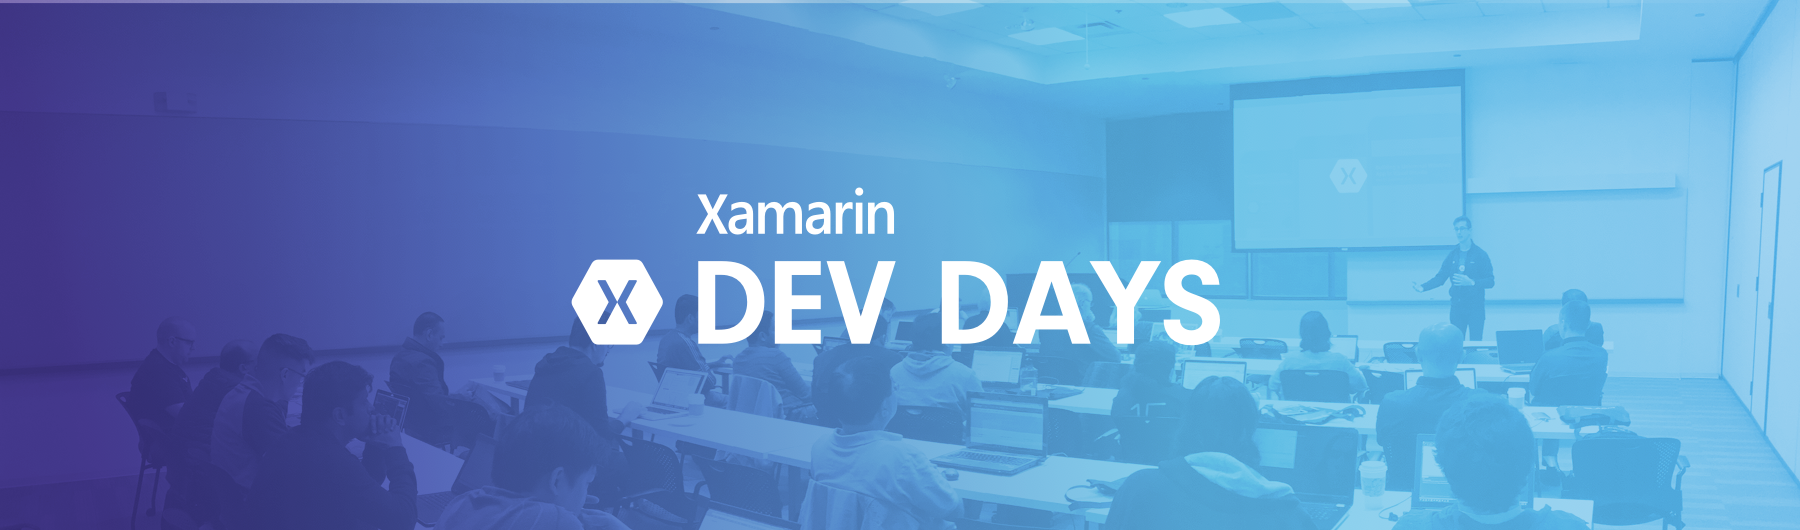 Xamarin Dev Days - Zihuatanejo